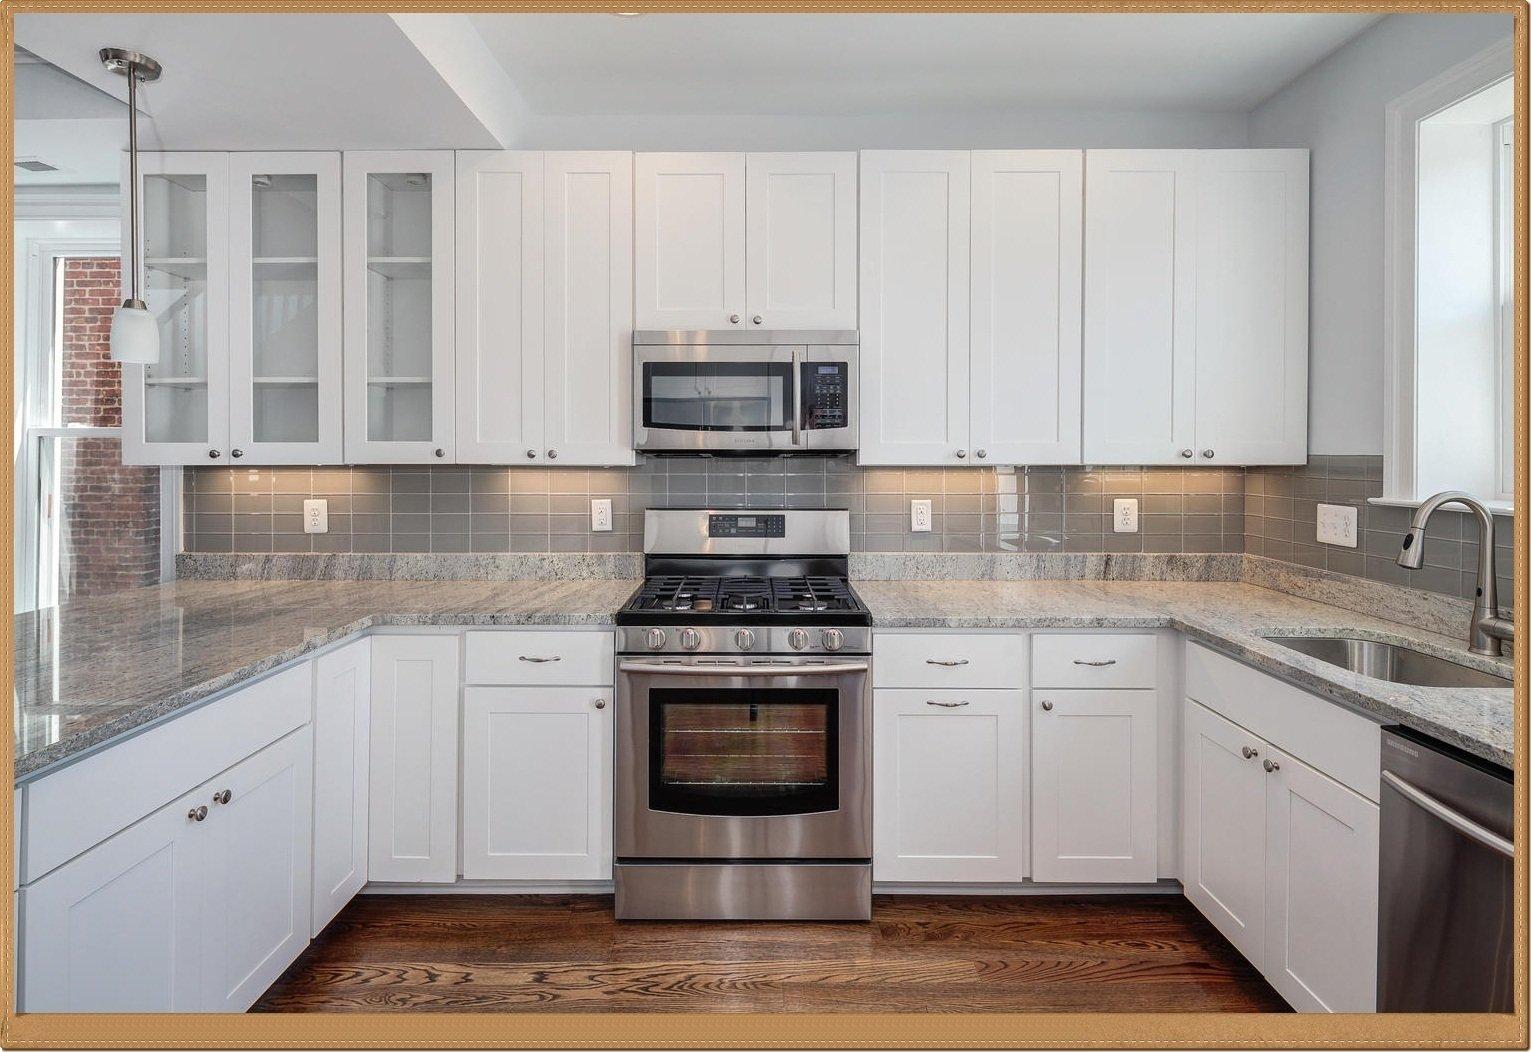 10 Pretty Ideas For Backsplash In Kitchen brilliant white cabinet kitchen ideas 30 white kitchen backsplash 2 2021